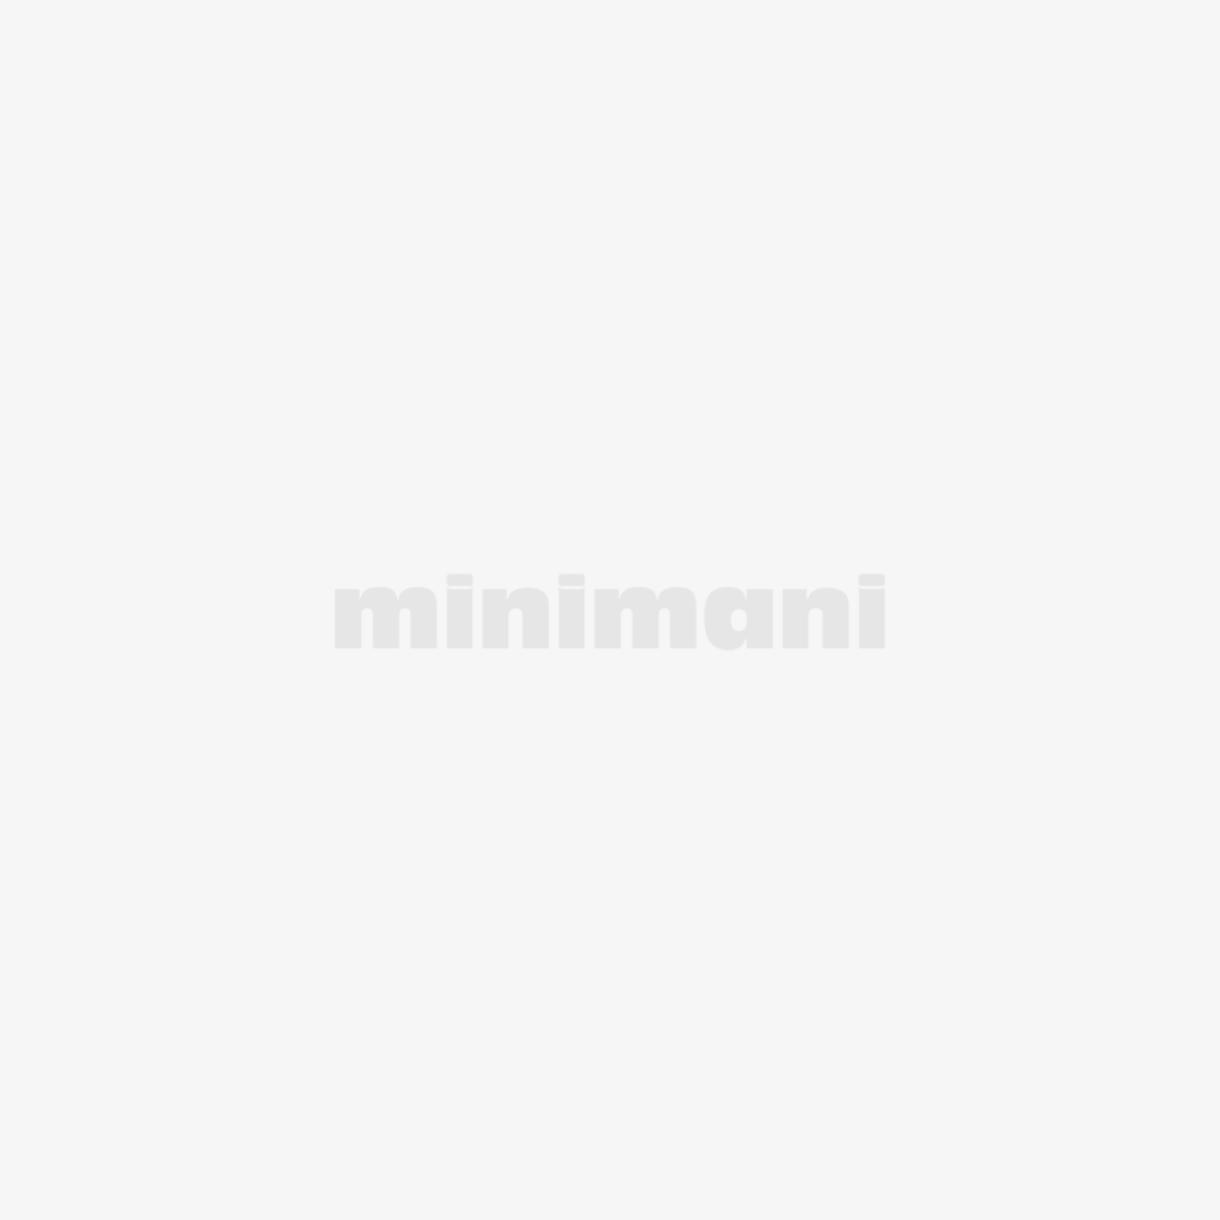 PISLA PAOLATANKO 16/19 MM 120-210 MATTA/KROM